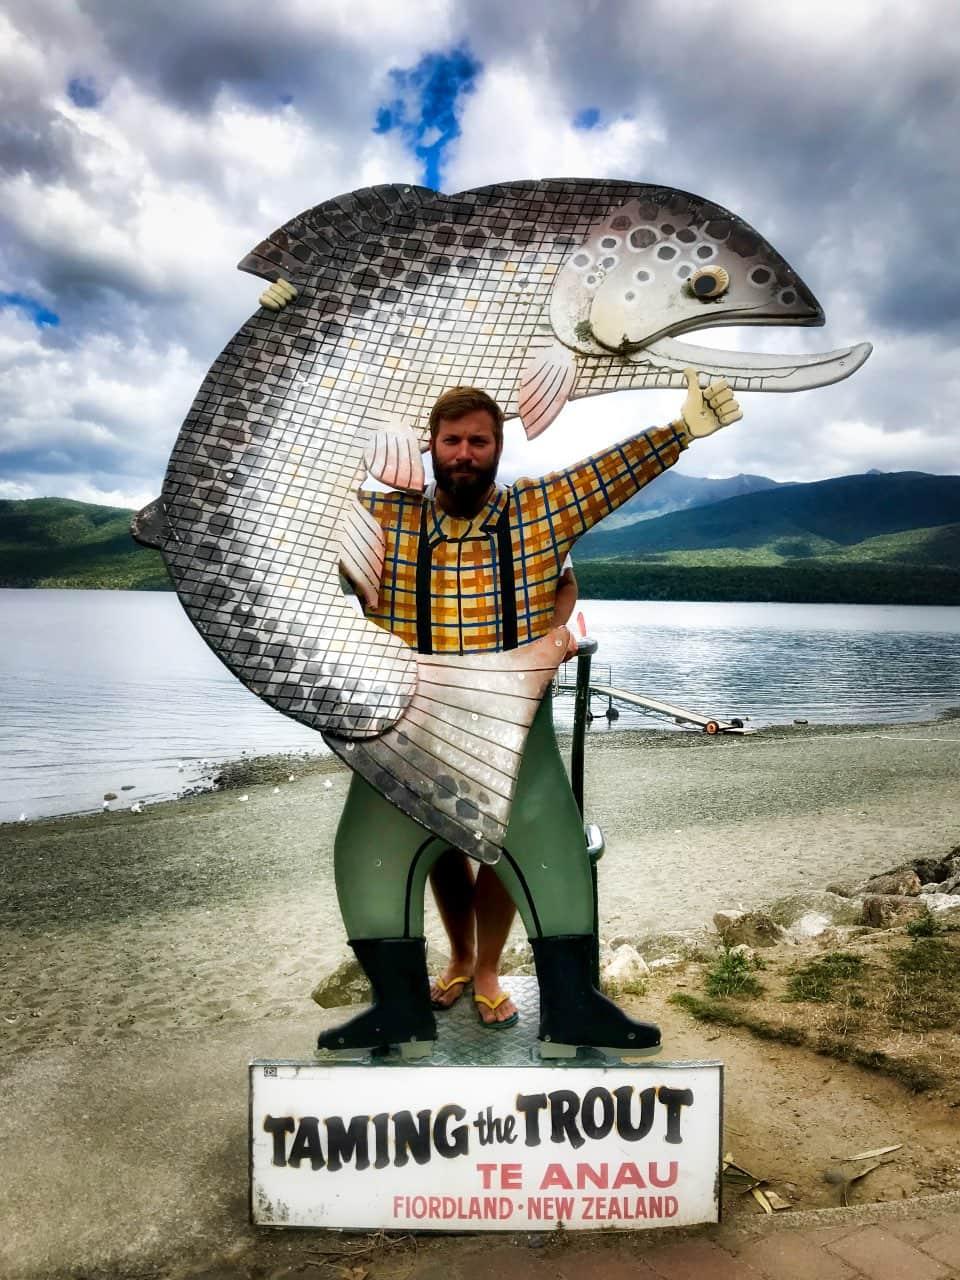 Te-Anau-taming-the-trout-funny-Kasi